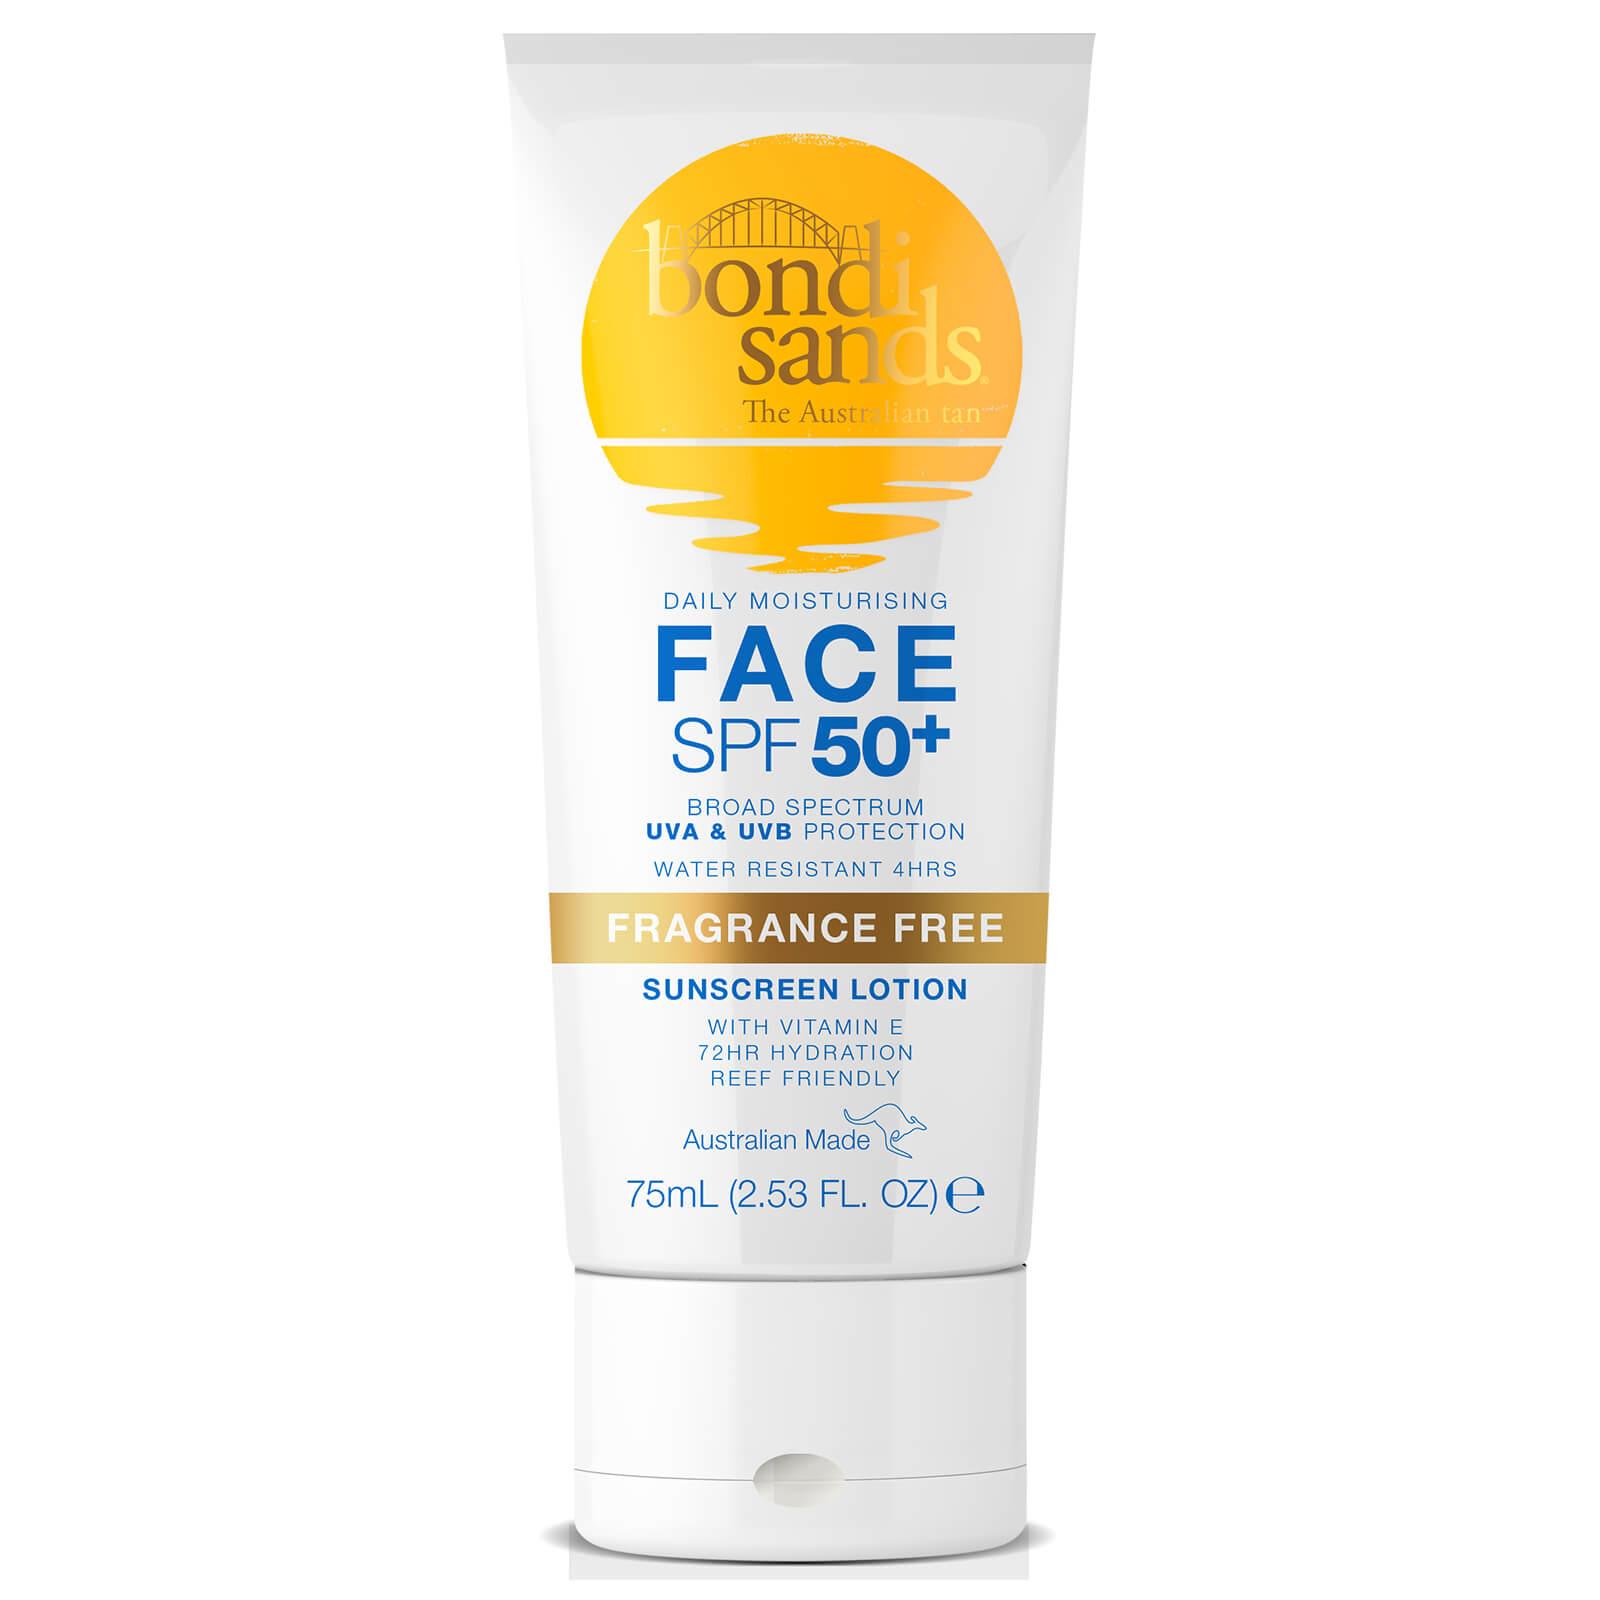 Bondi Sands Sunscreen Lotion SPF50+ - Face 75ml